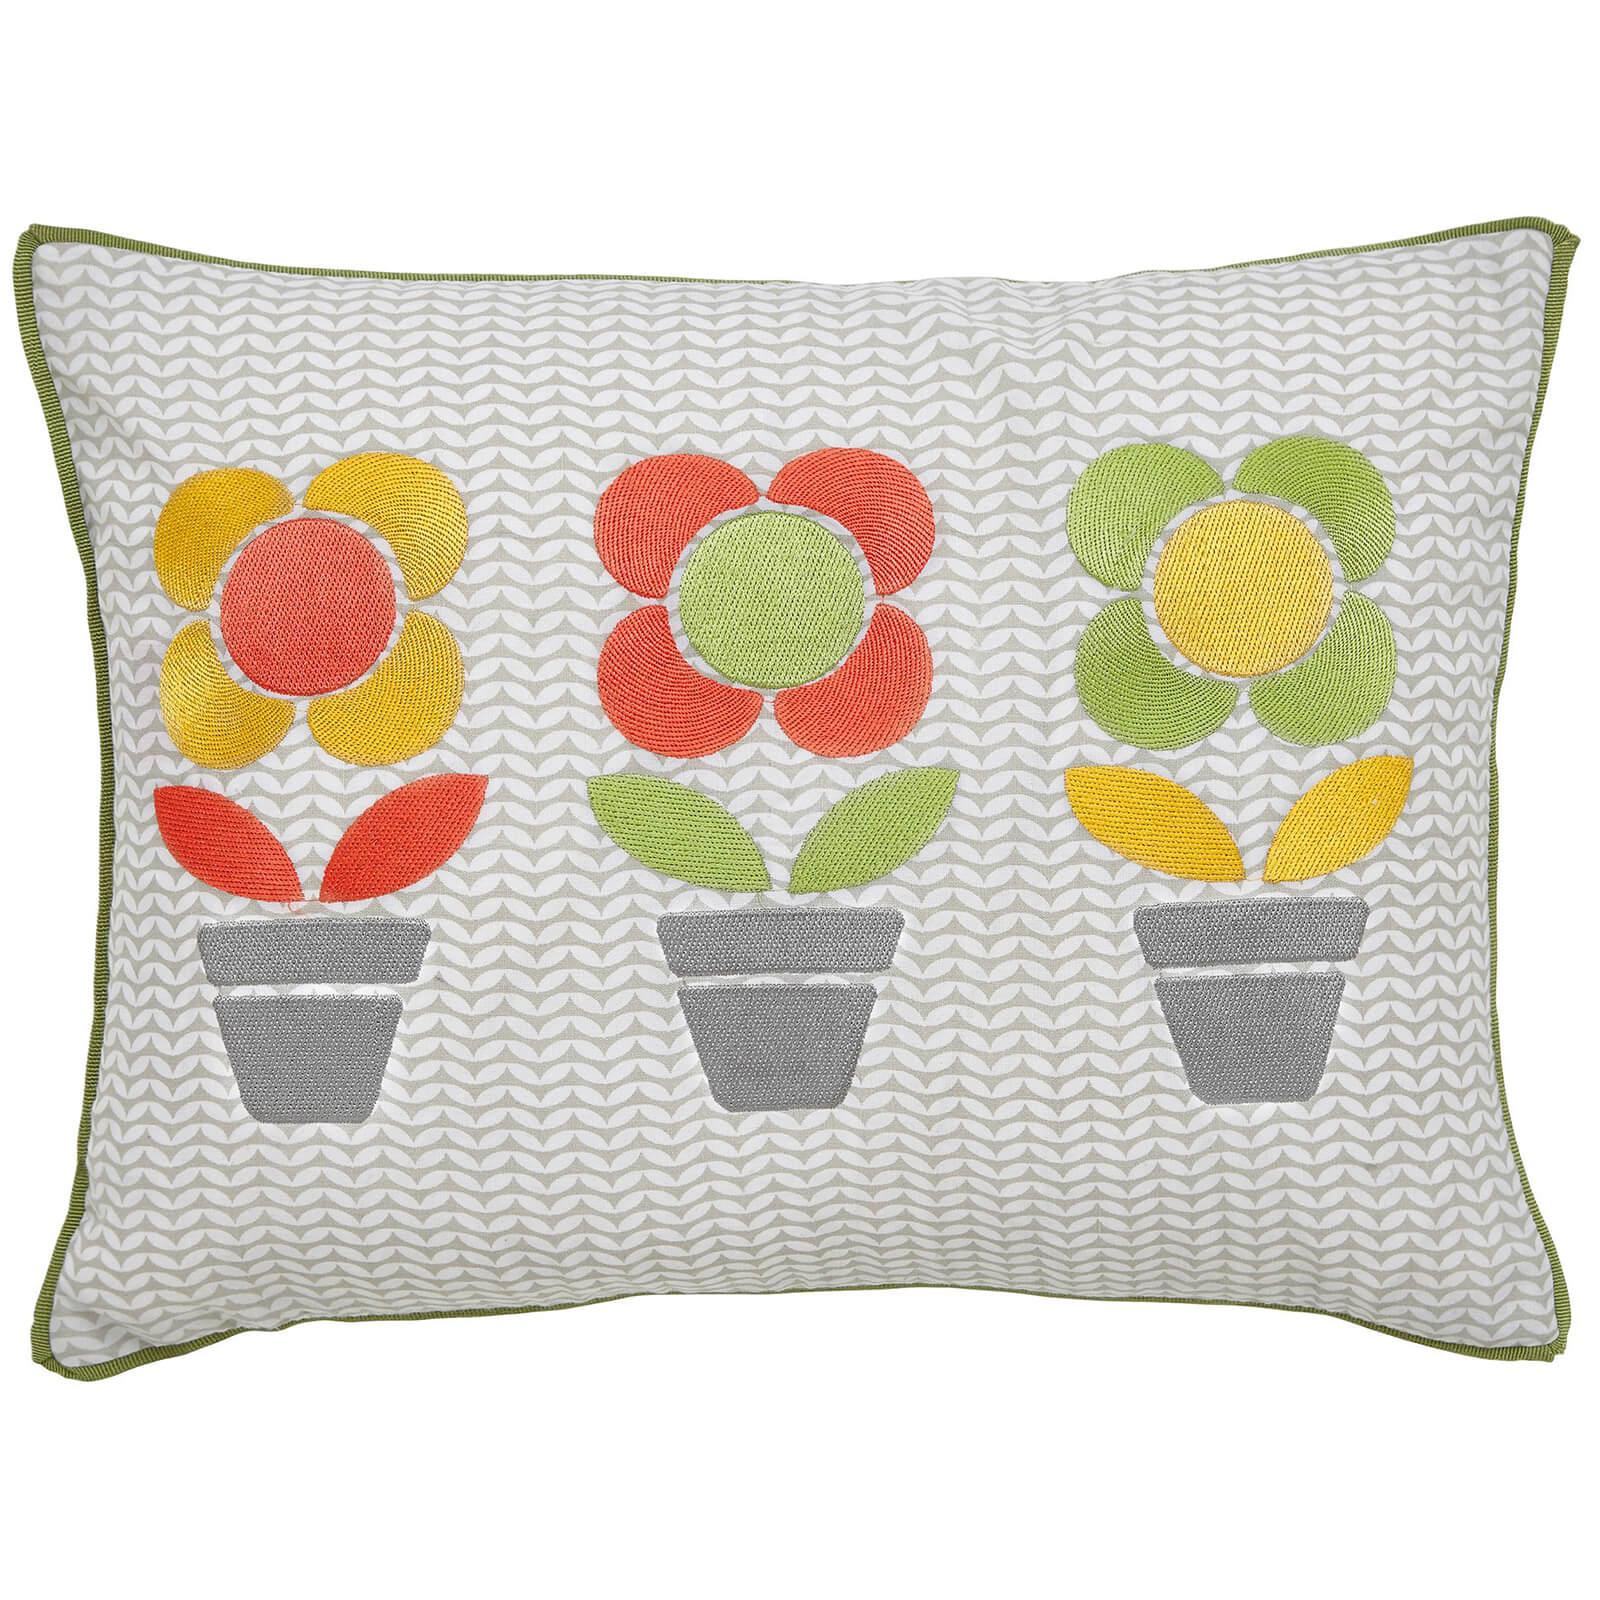 Helena Springfield April Cushion - Green